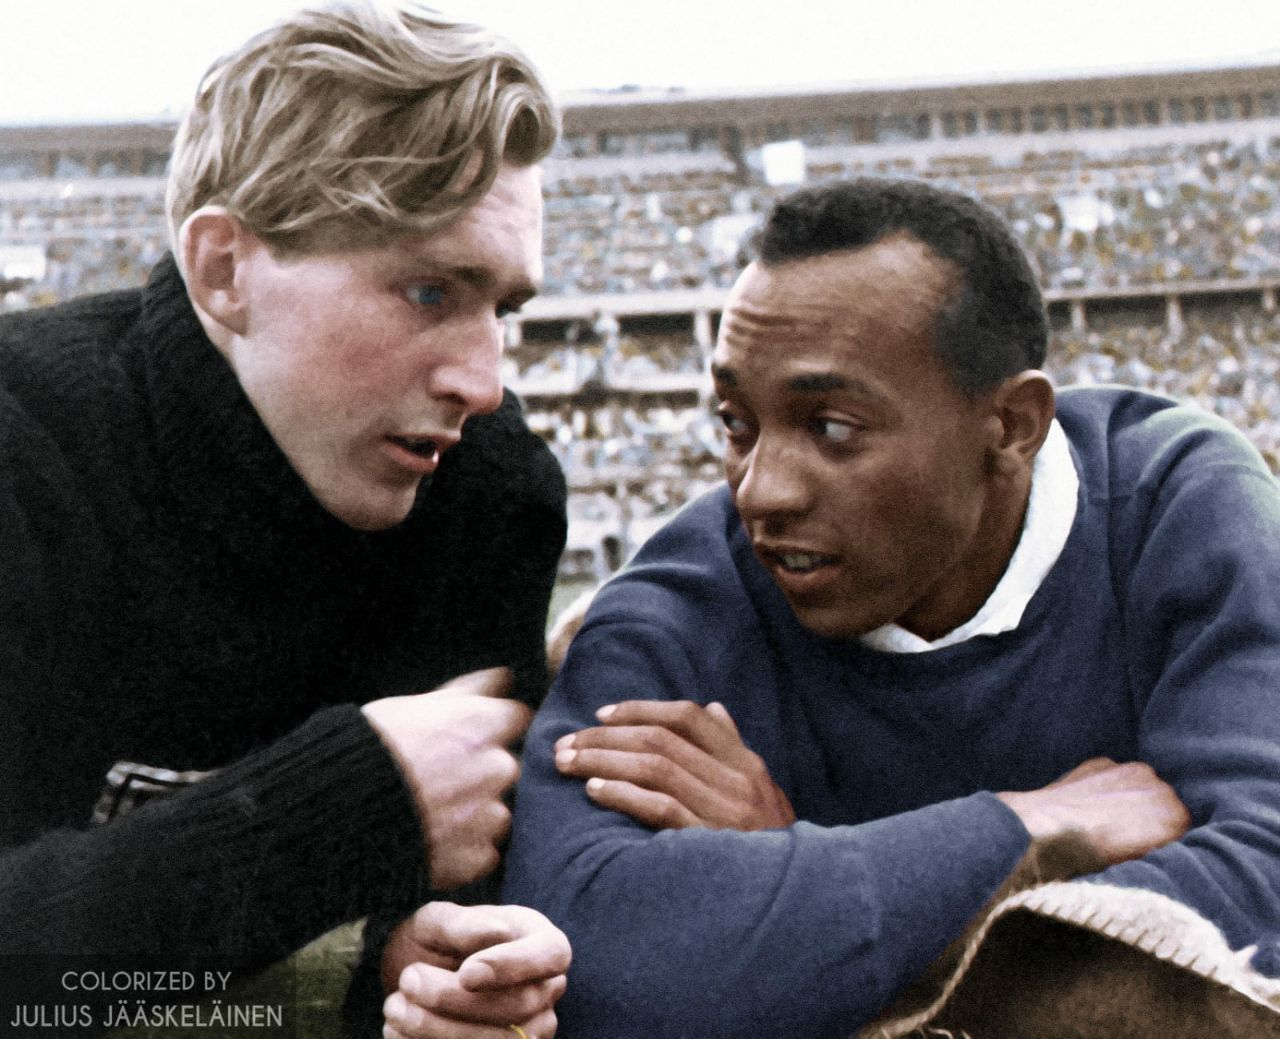 olimpiada berlin 1936 jesse owens luz landon 4